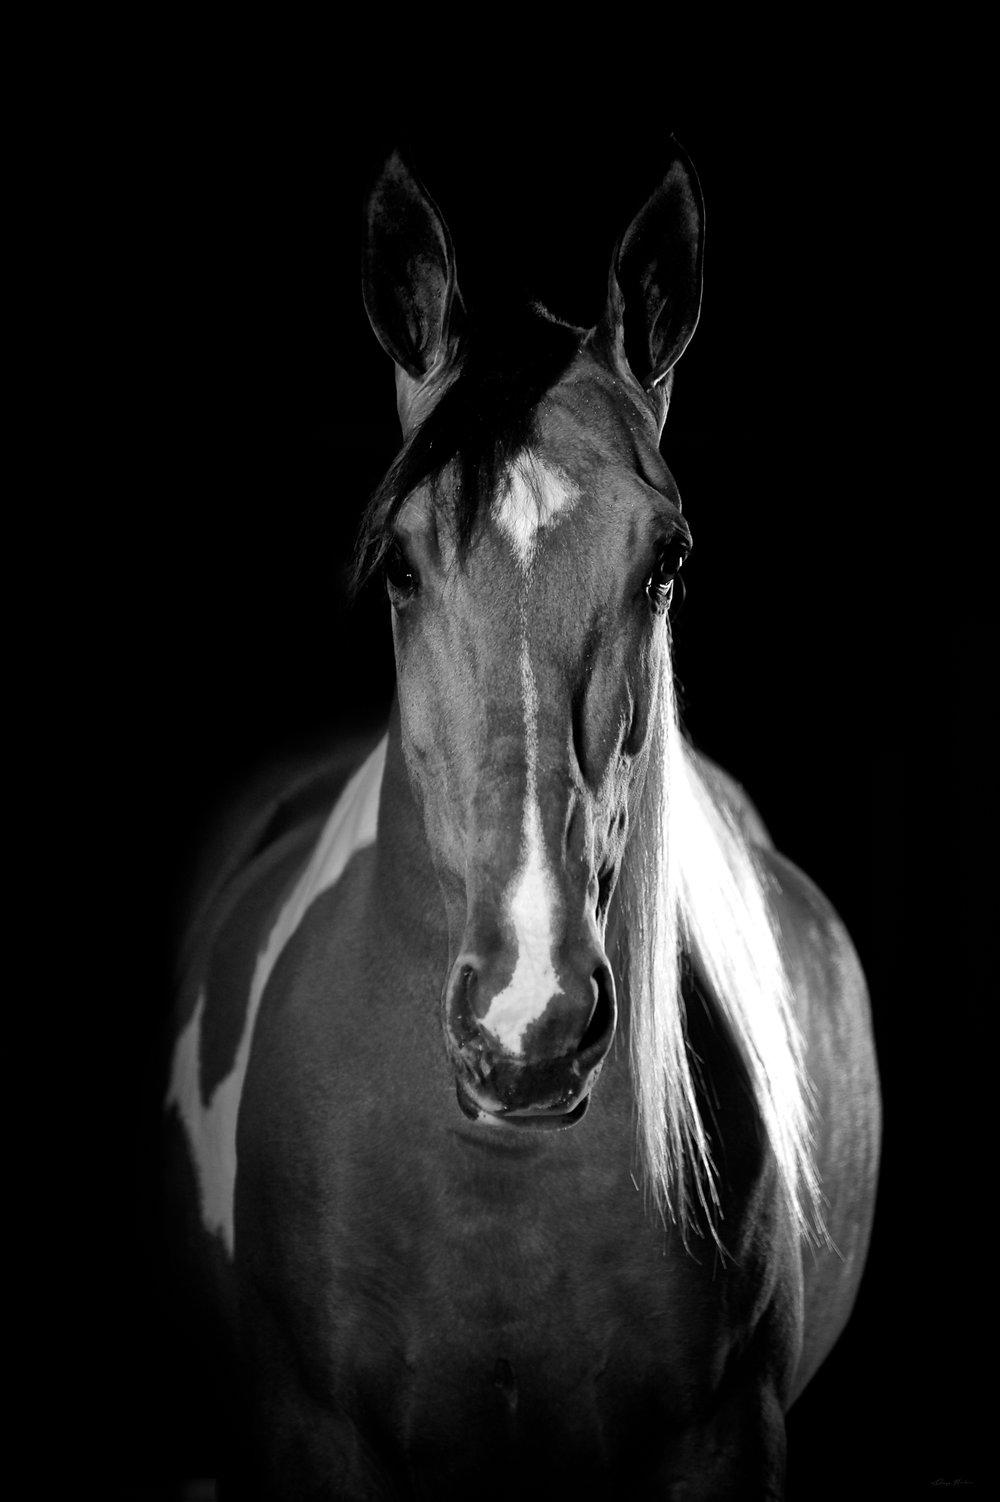 DH_SquareSpace_equus-307_161019.jpg